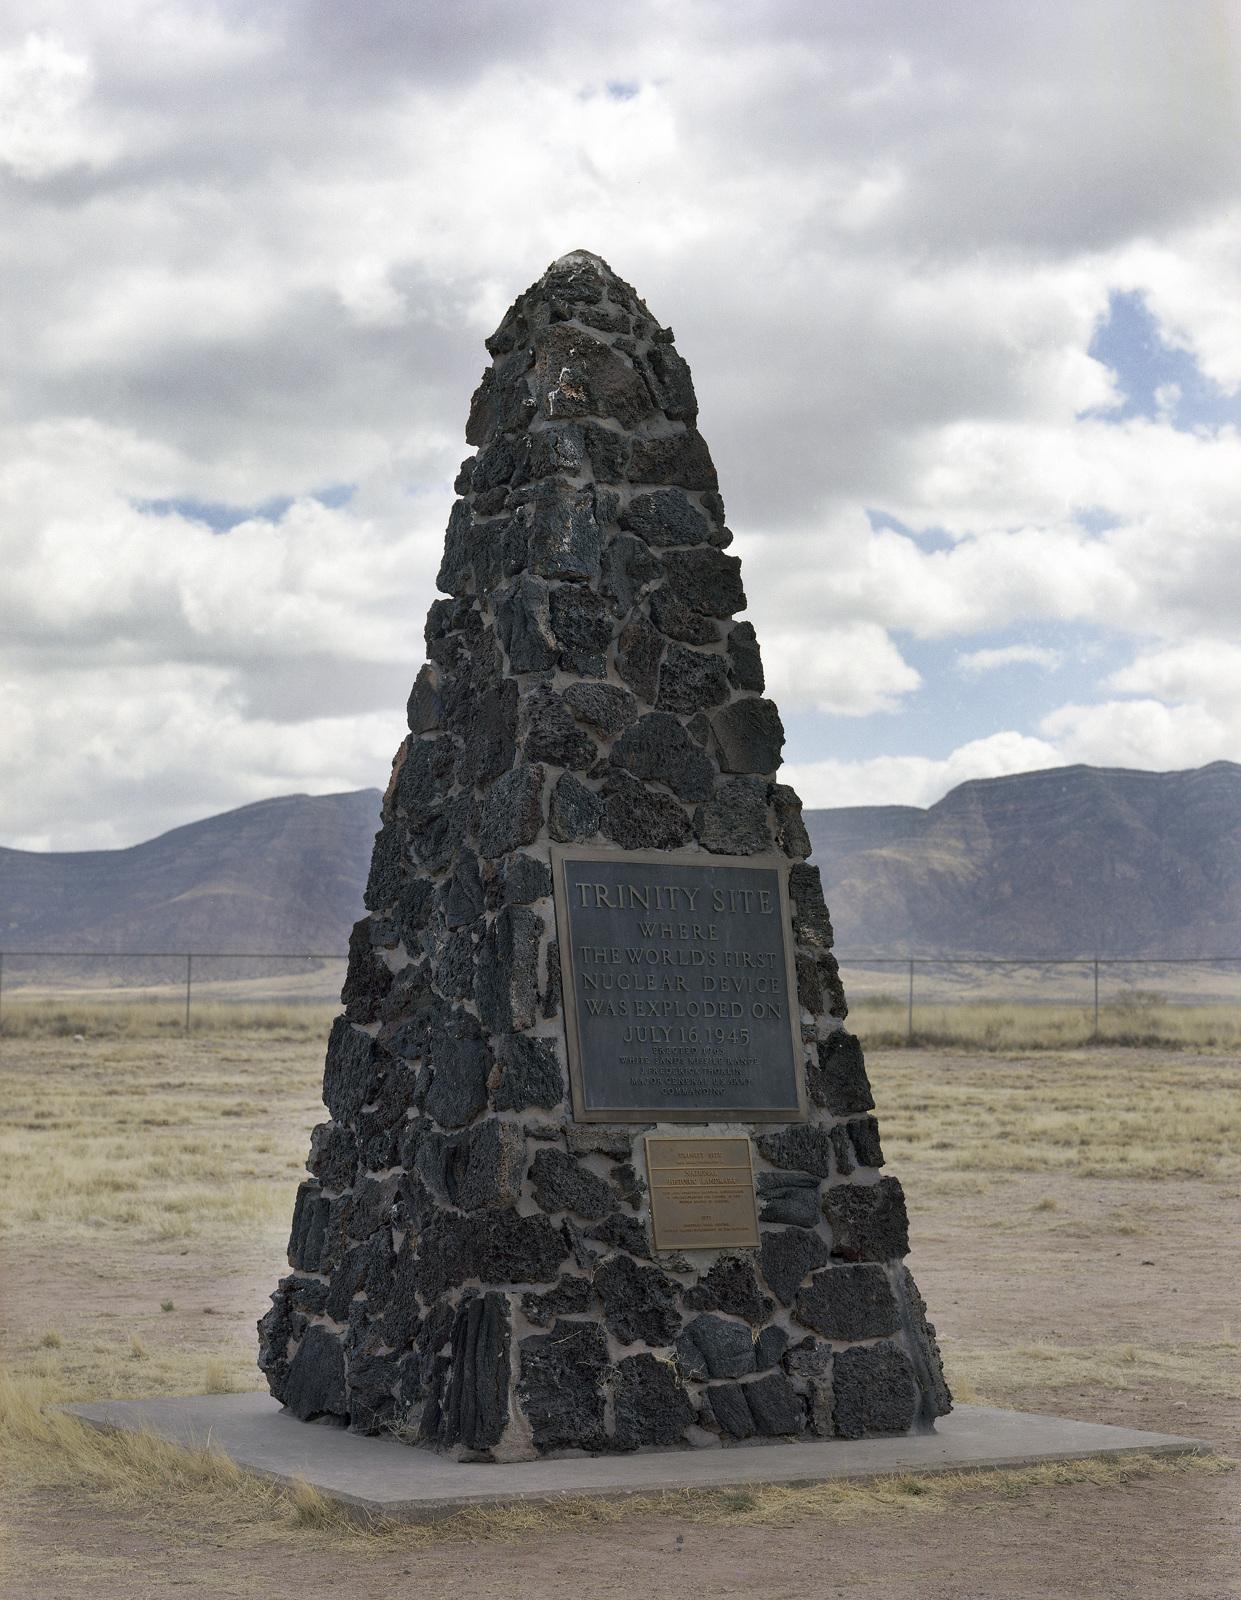 Trinity Site, New Mexico